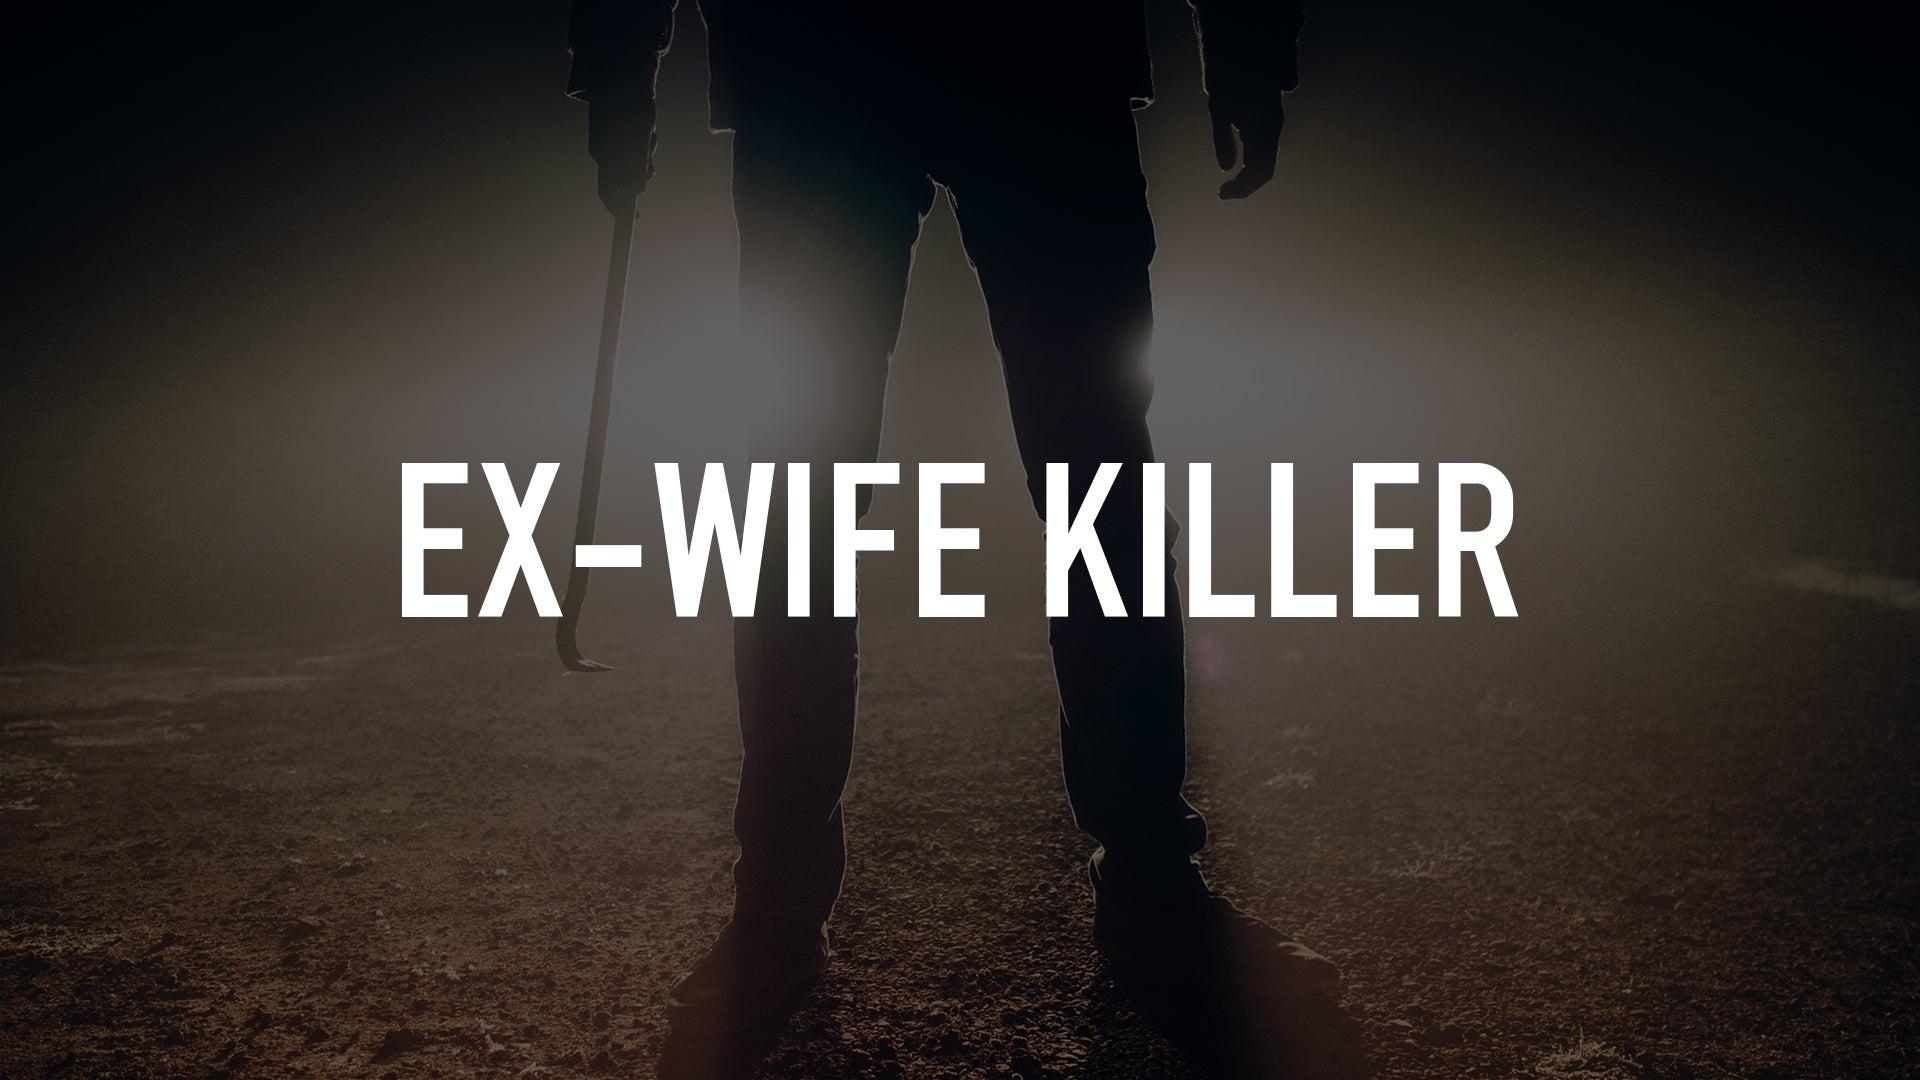 Ex-Wife Killer